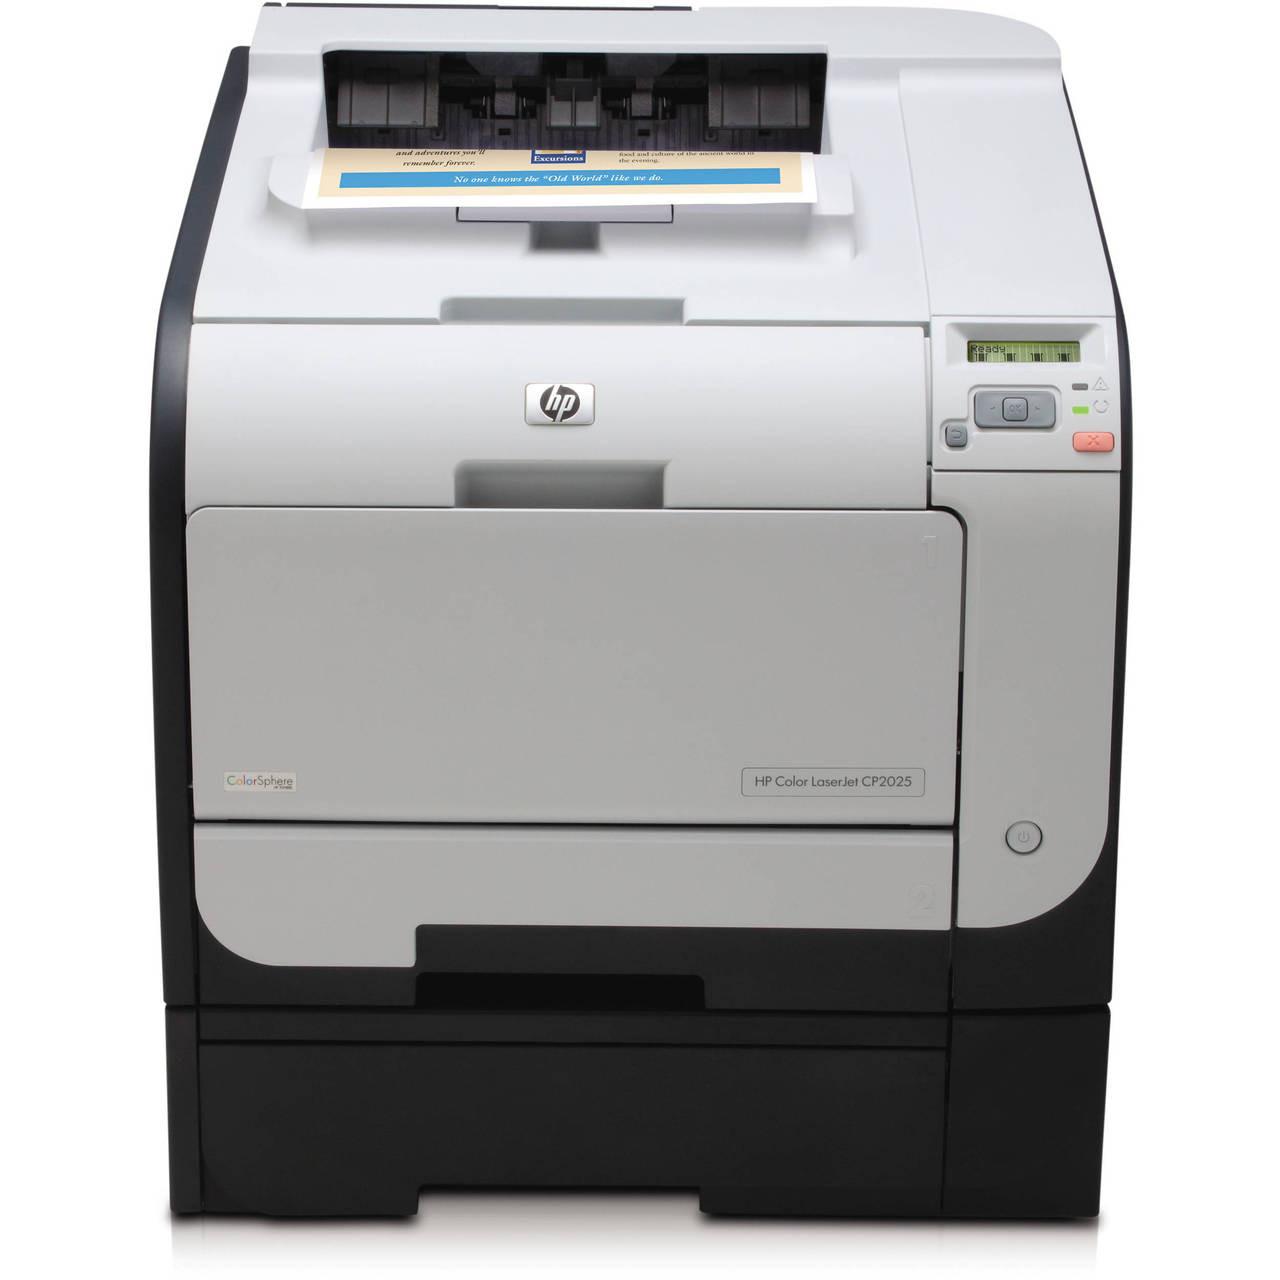 HP COLOR LASERJET CP2025X - CB496A - HP LASER PRINTER for sale